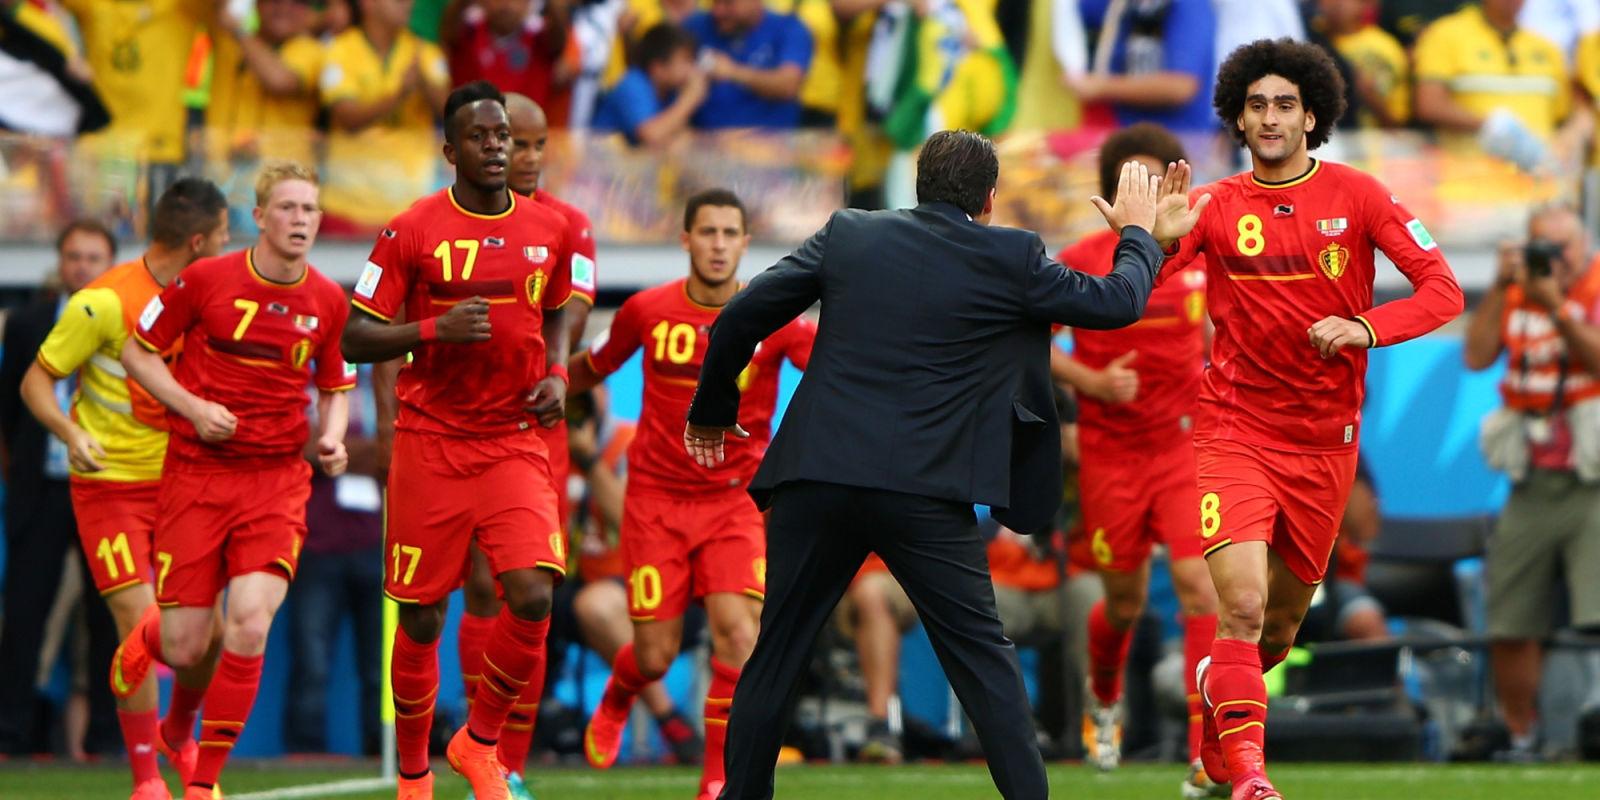 на в по бельгия бразилии ставки матч чемпионате россия футболу мира